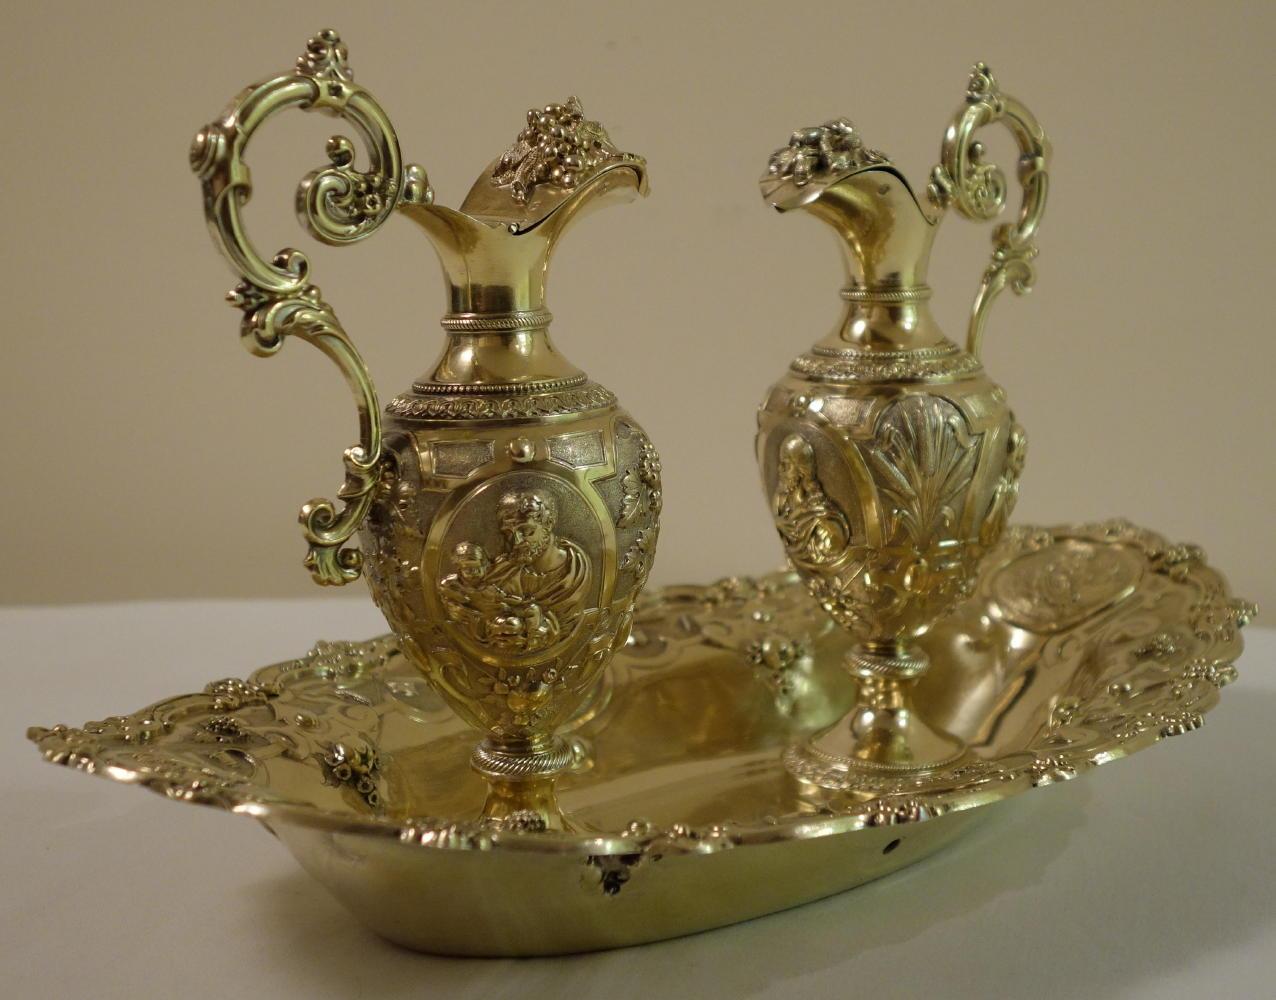 luzar vestments  cruets  antique and secondhand baroque  -  antique solid silver gilt french baroque cruets